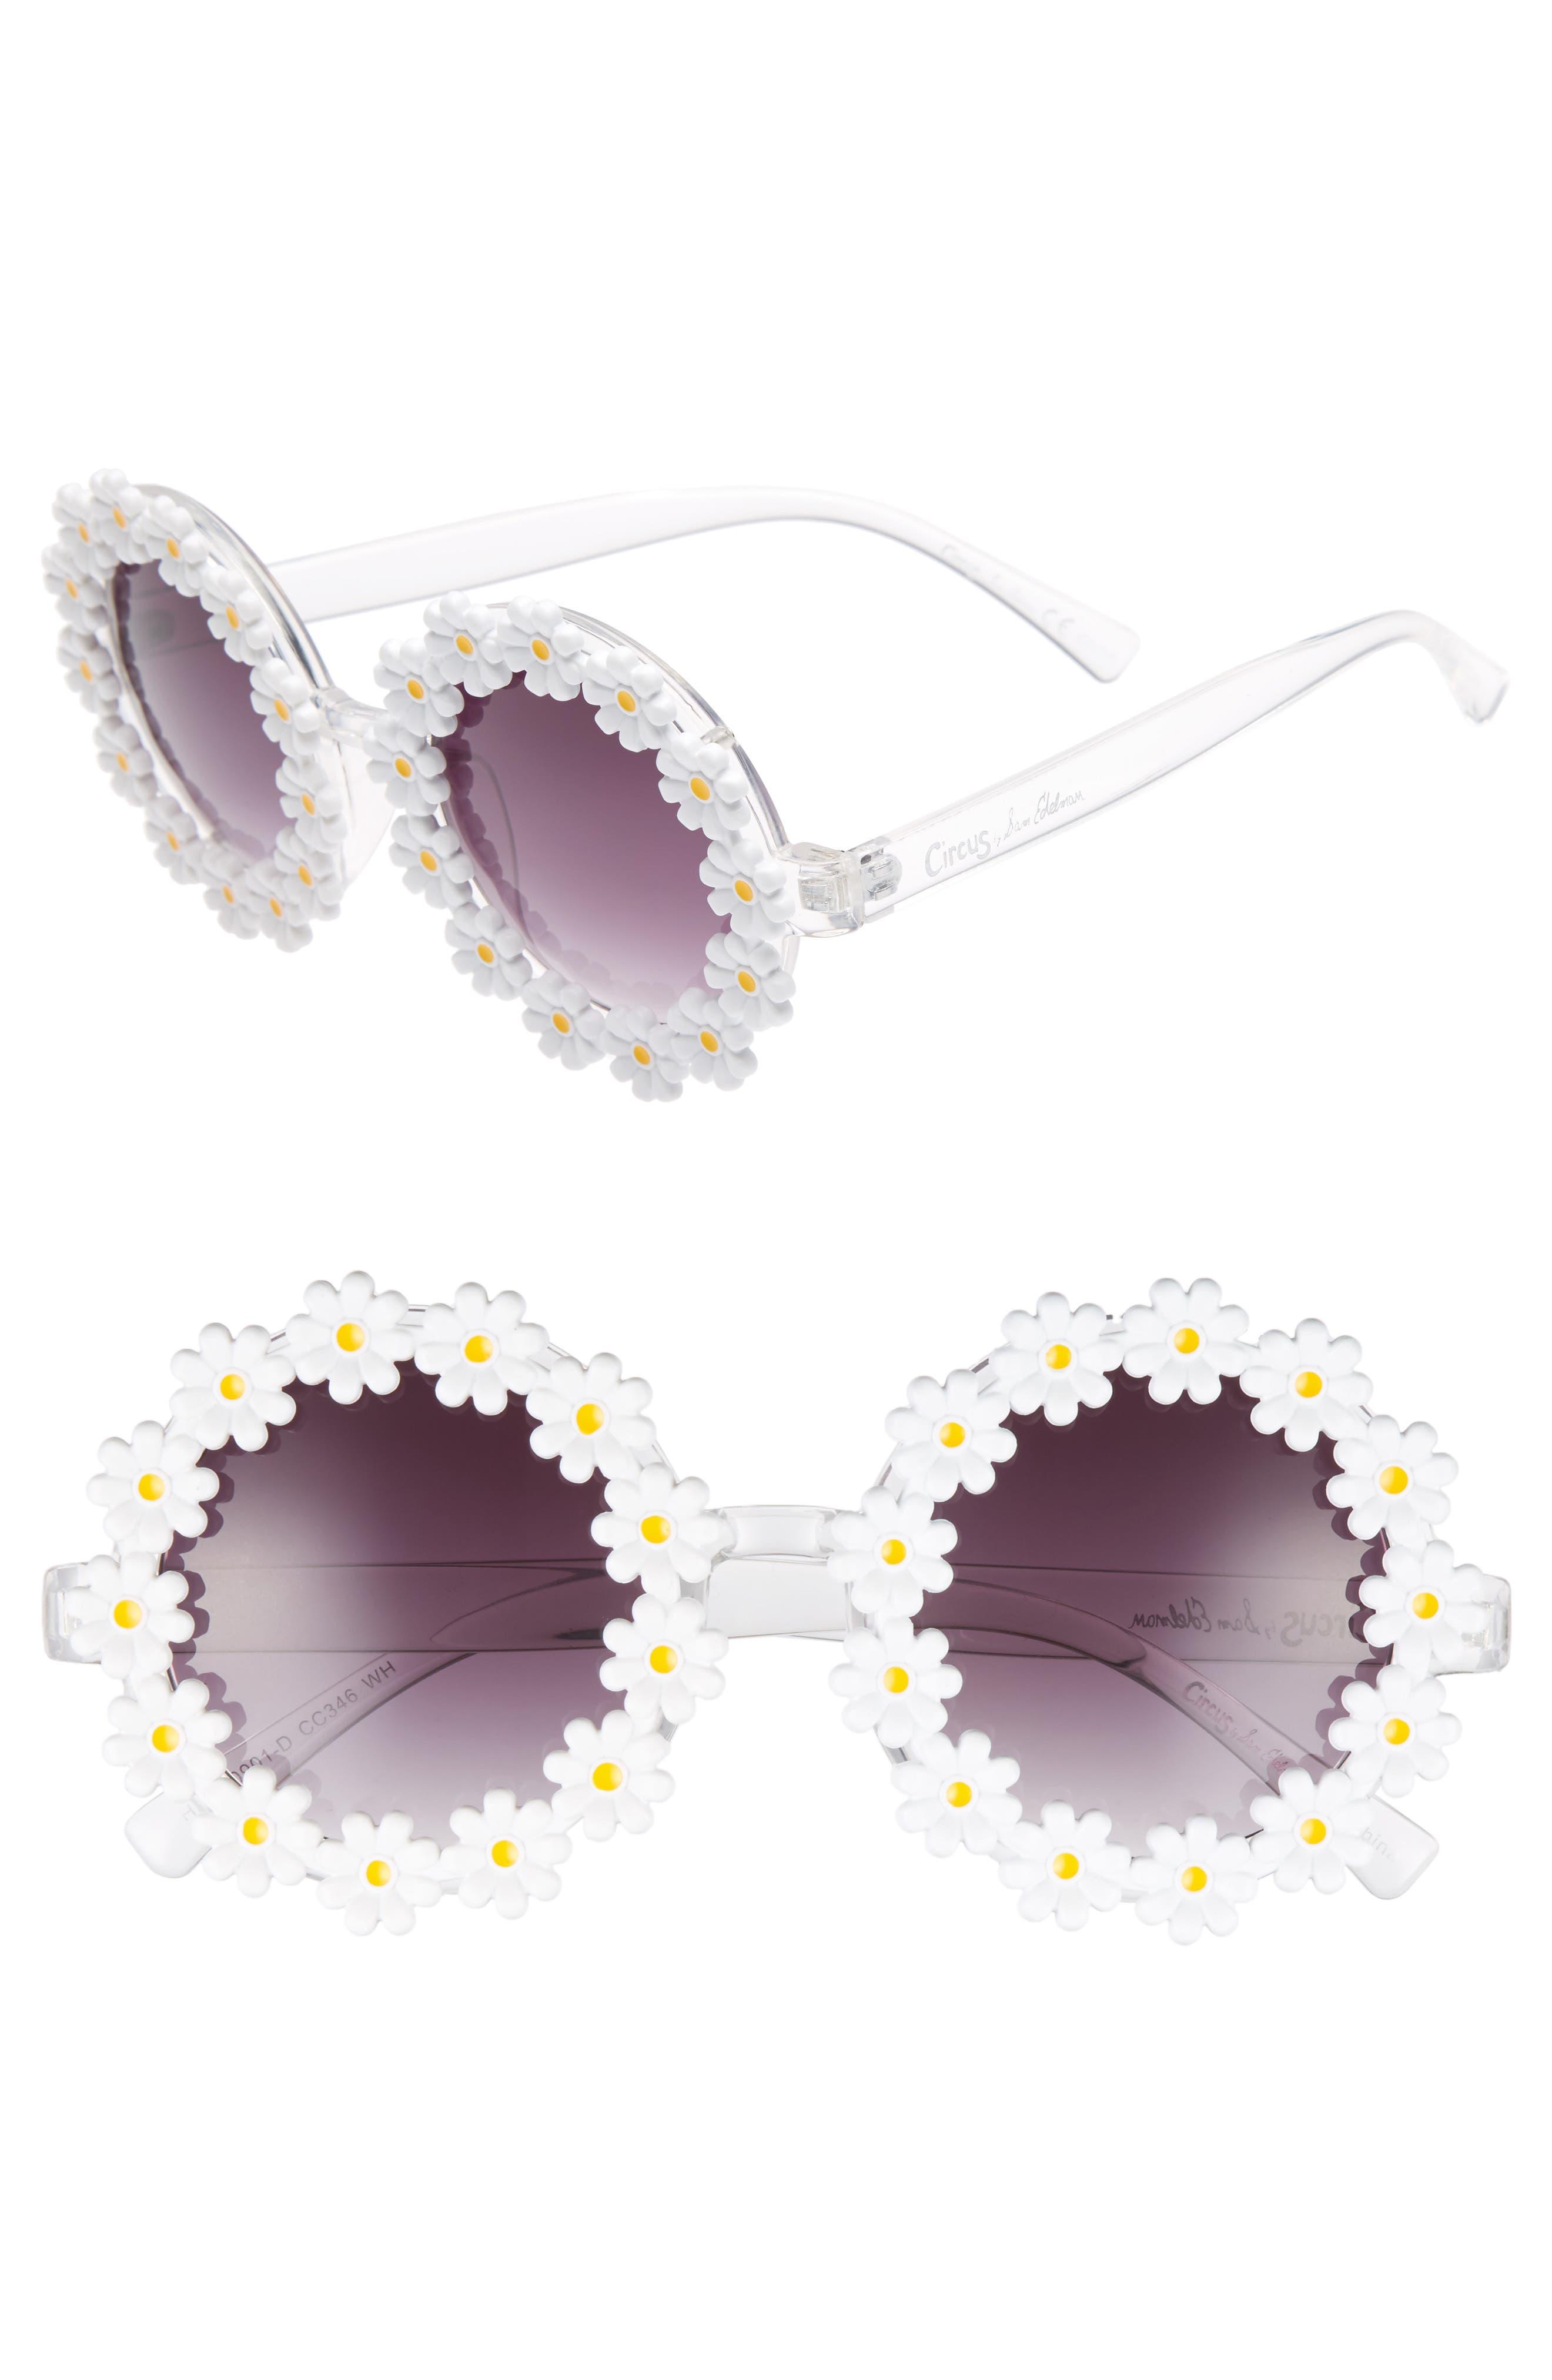 45mm Round Sunglasses,                         Main,                         color, White